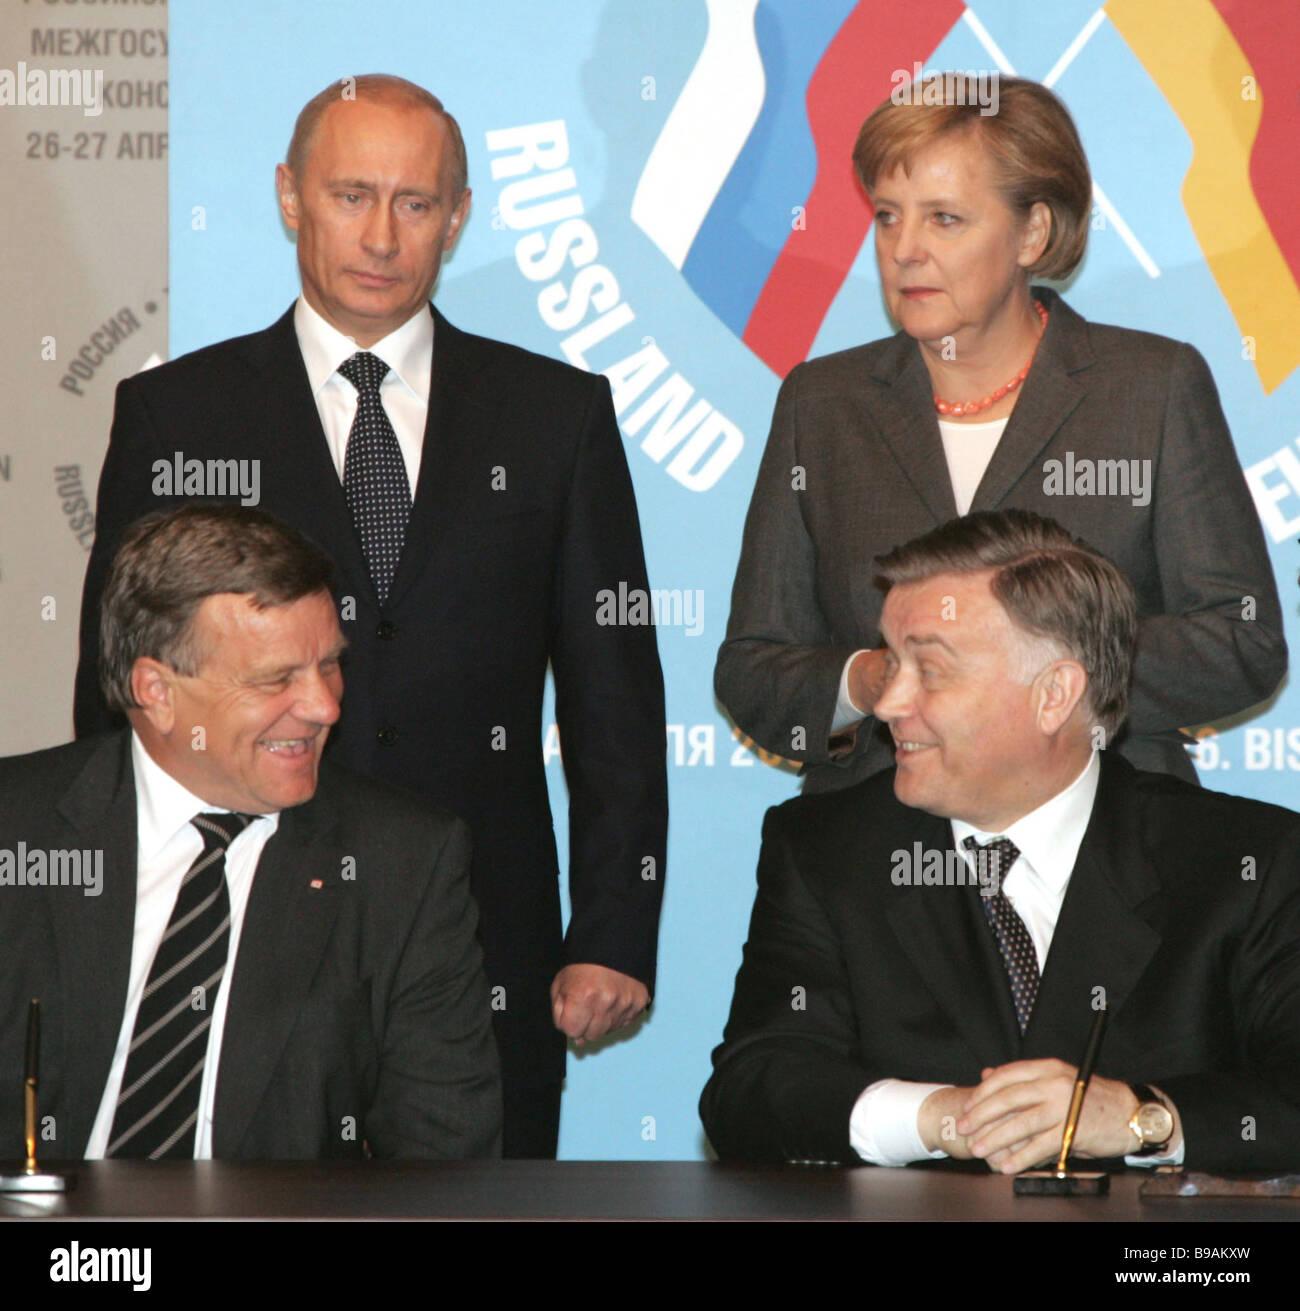 German railways chief Hartmut Medorn and the OAO Russian Railways president Vladimir Yakunin left to right in the - Stock Image